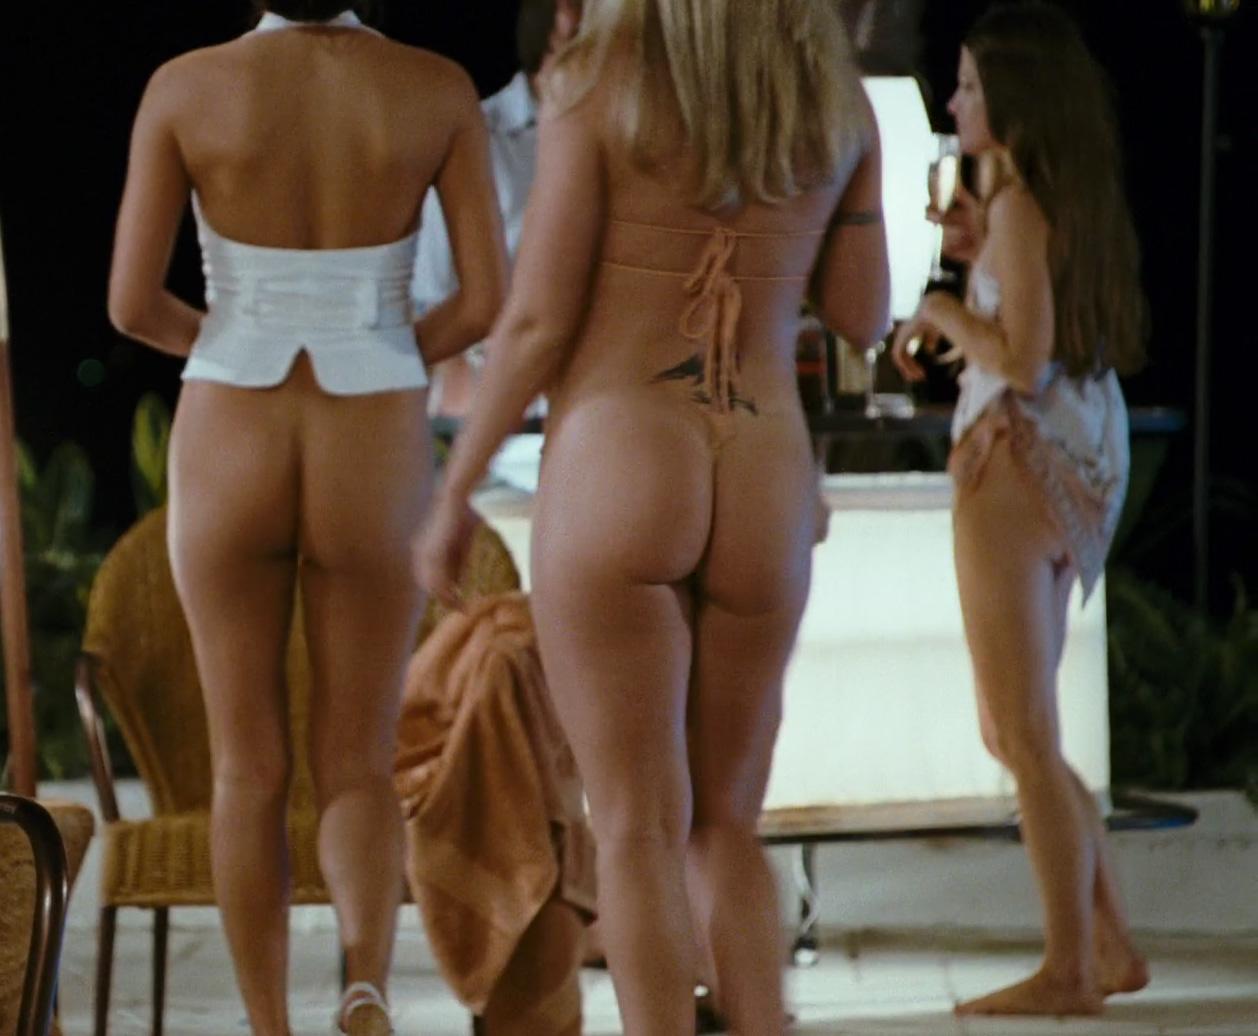 harold-and-kumar-nudity-image-pussy-movie